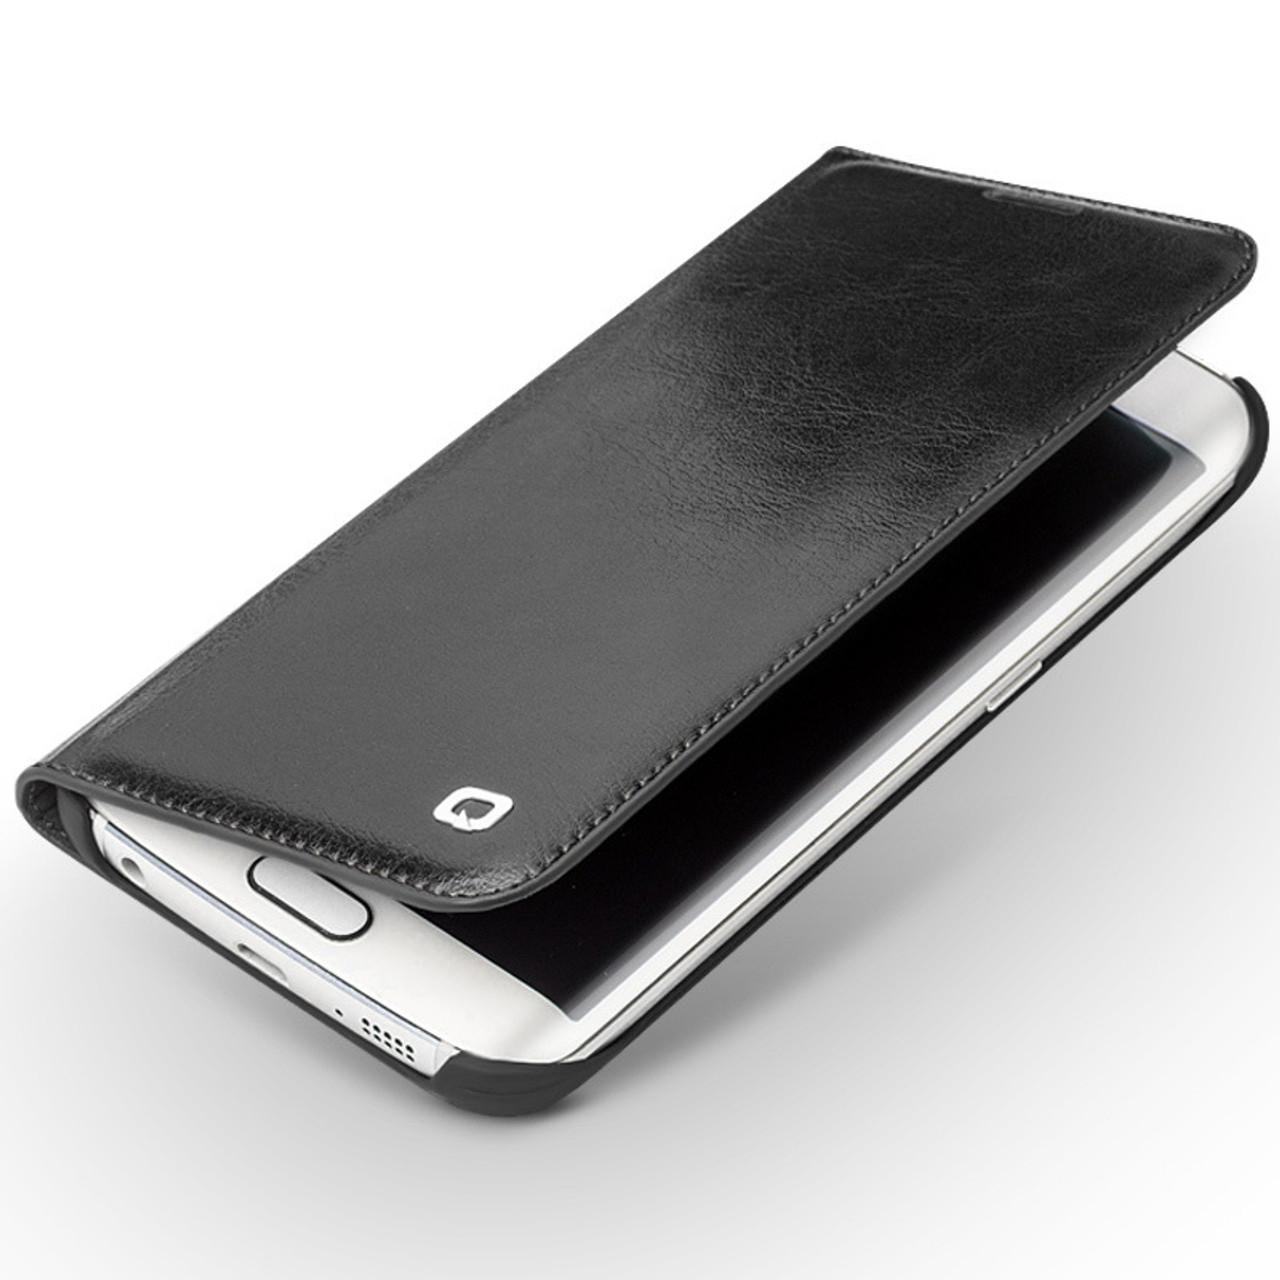 the best attitude 25125 427b3 Qialino Samsung S6 Edge+PLUS Leather Wallet Case Black